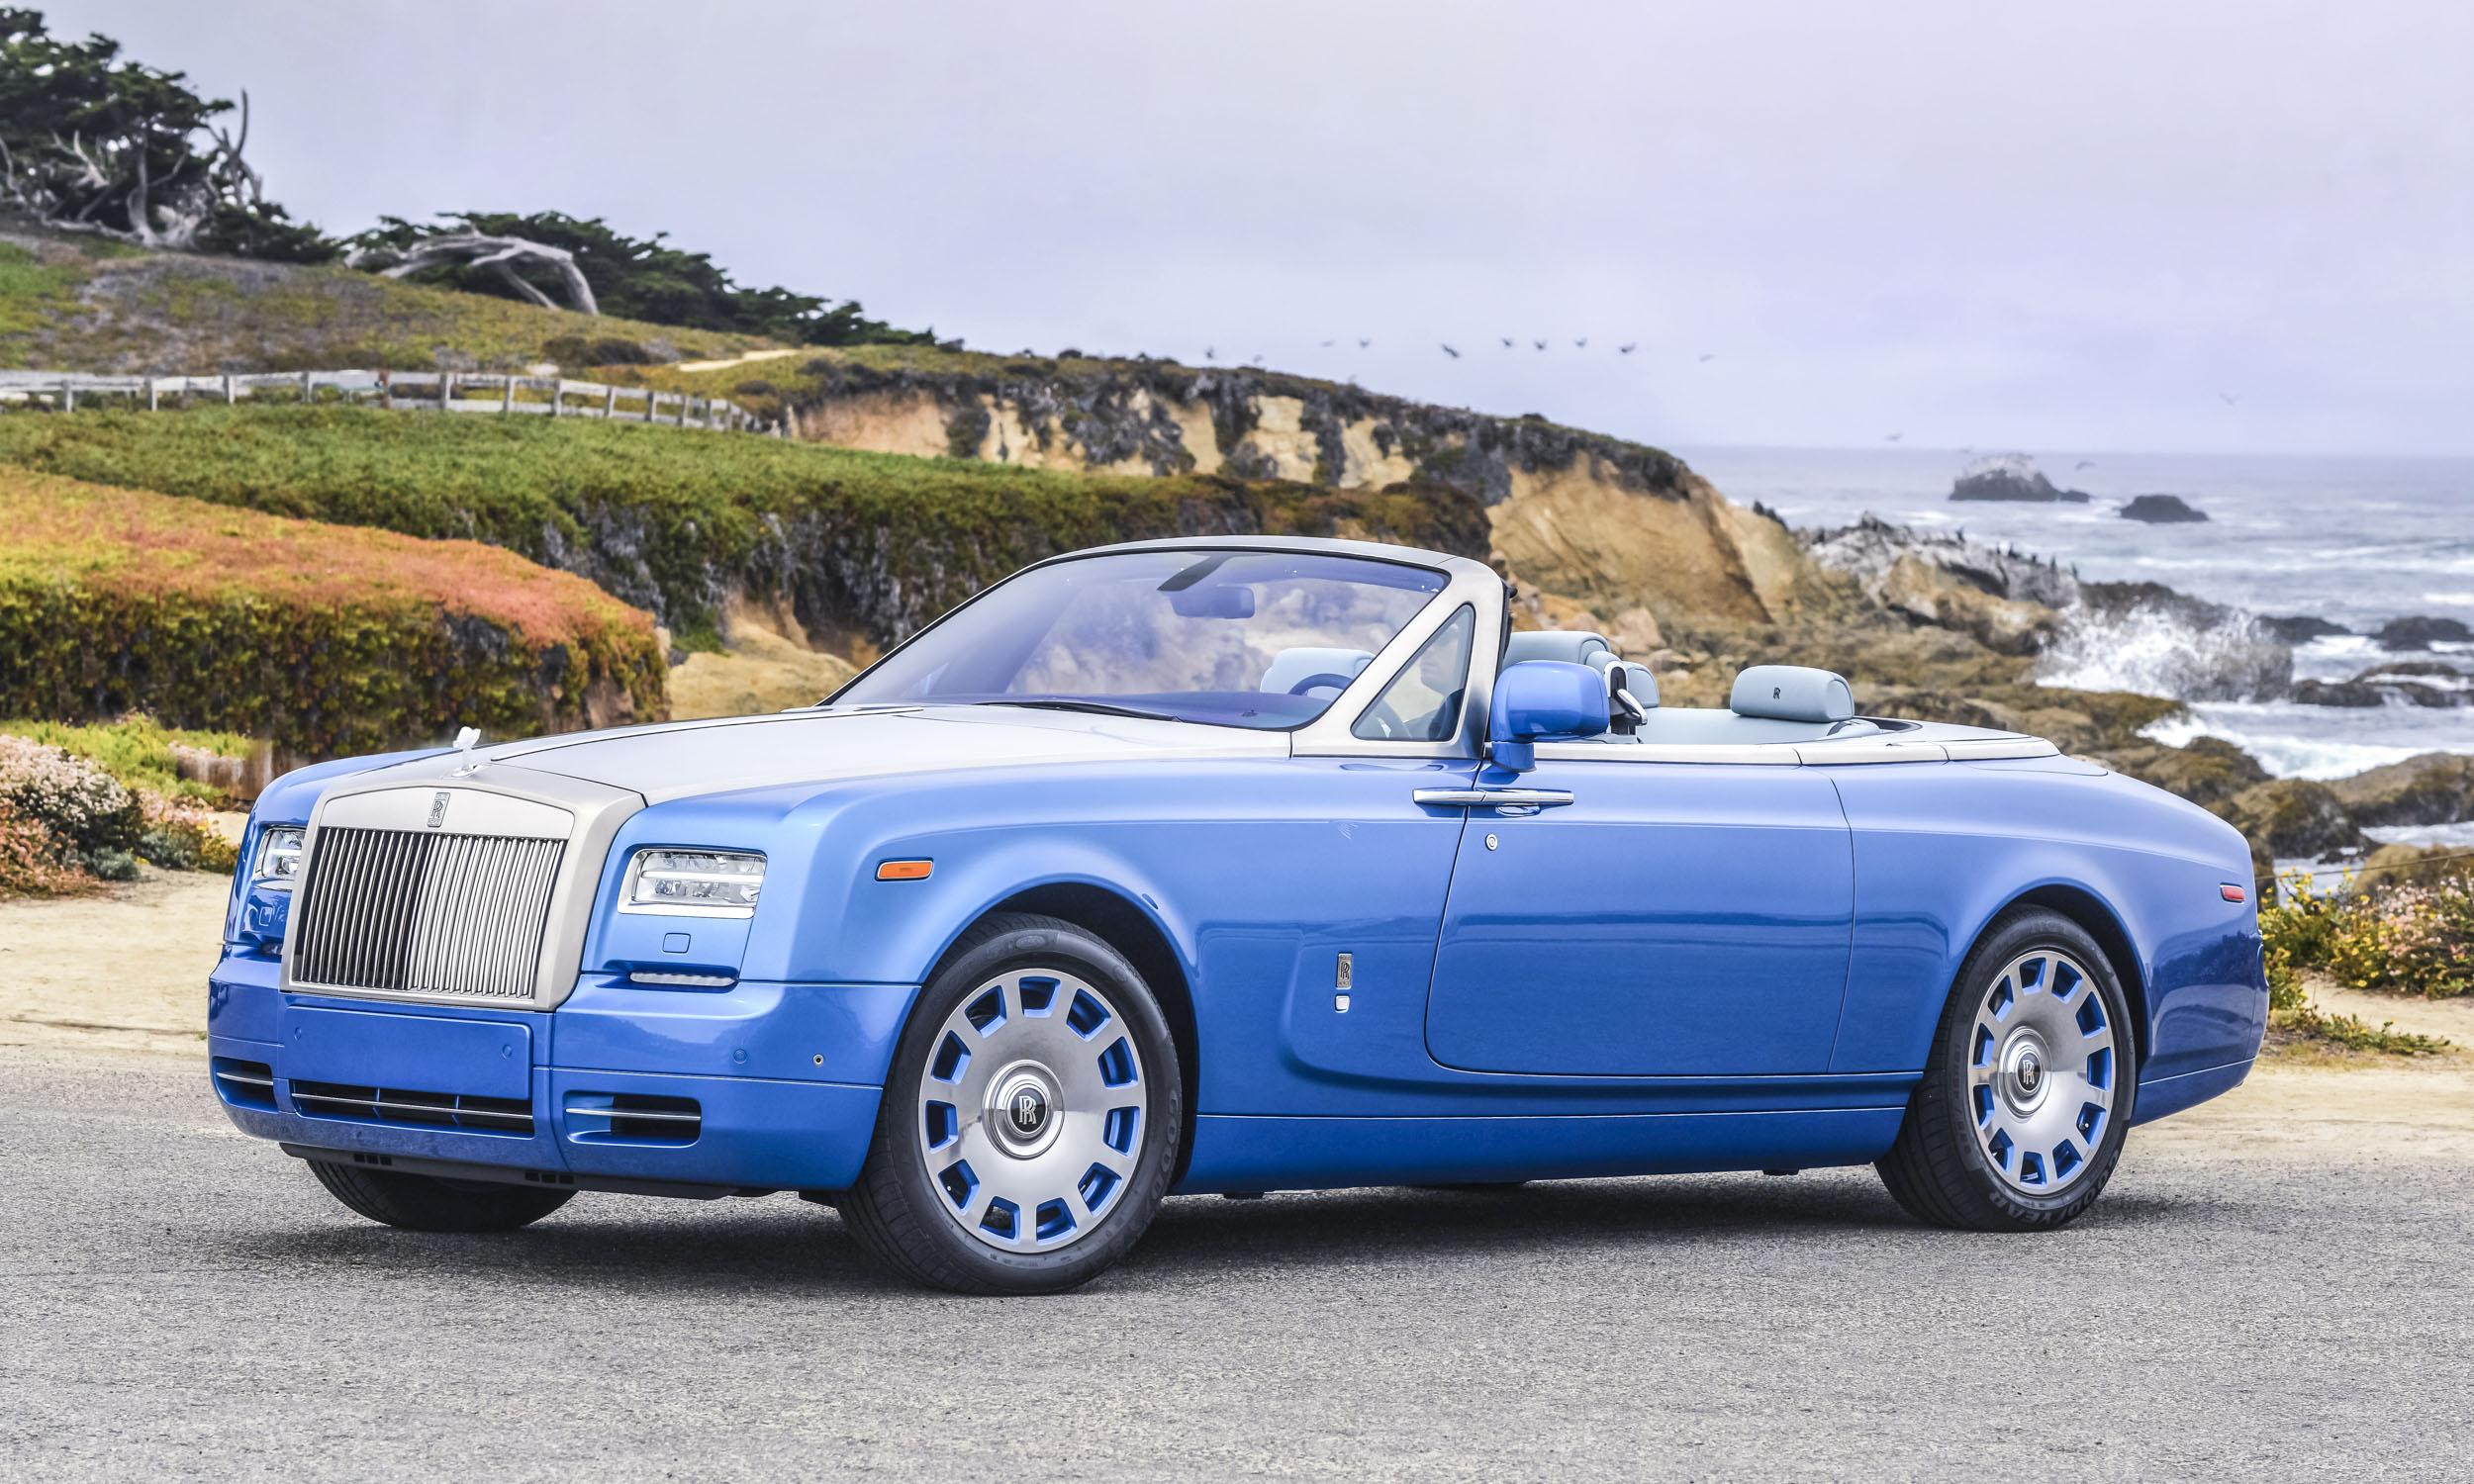 © Rolls-Royce Motor Cars Ltd